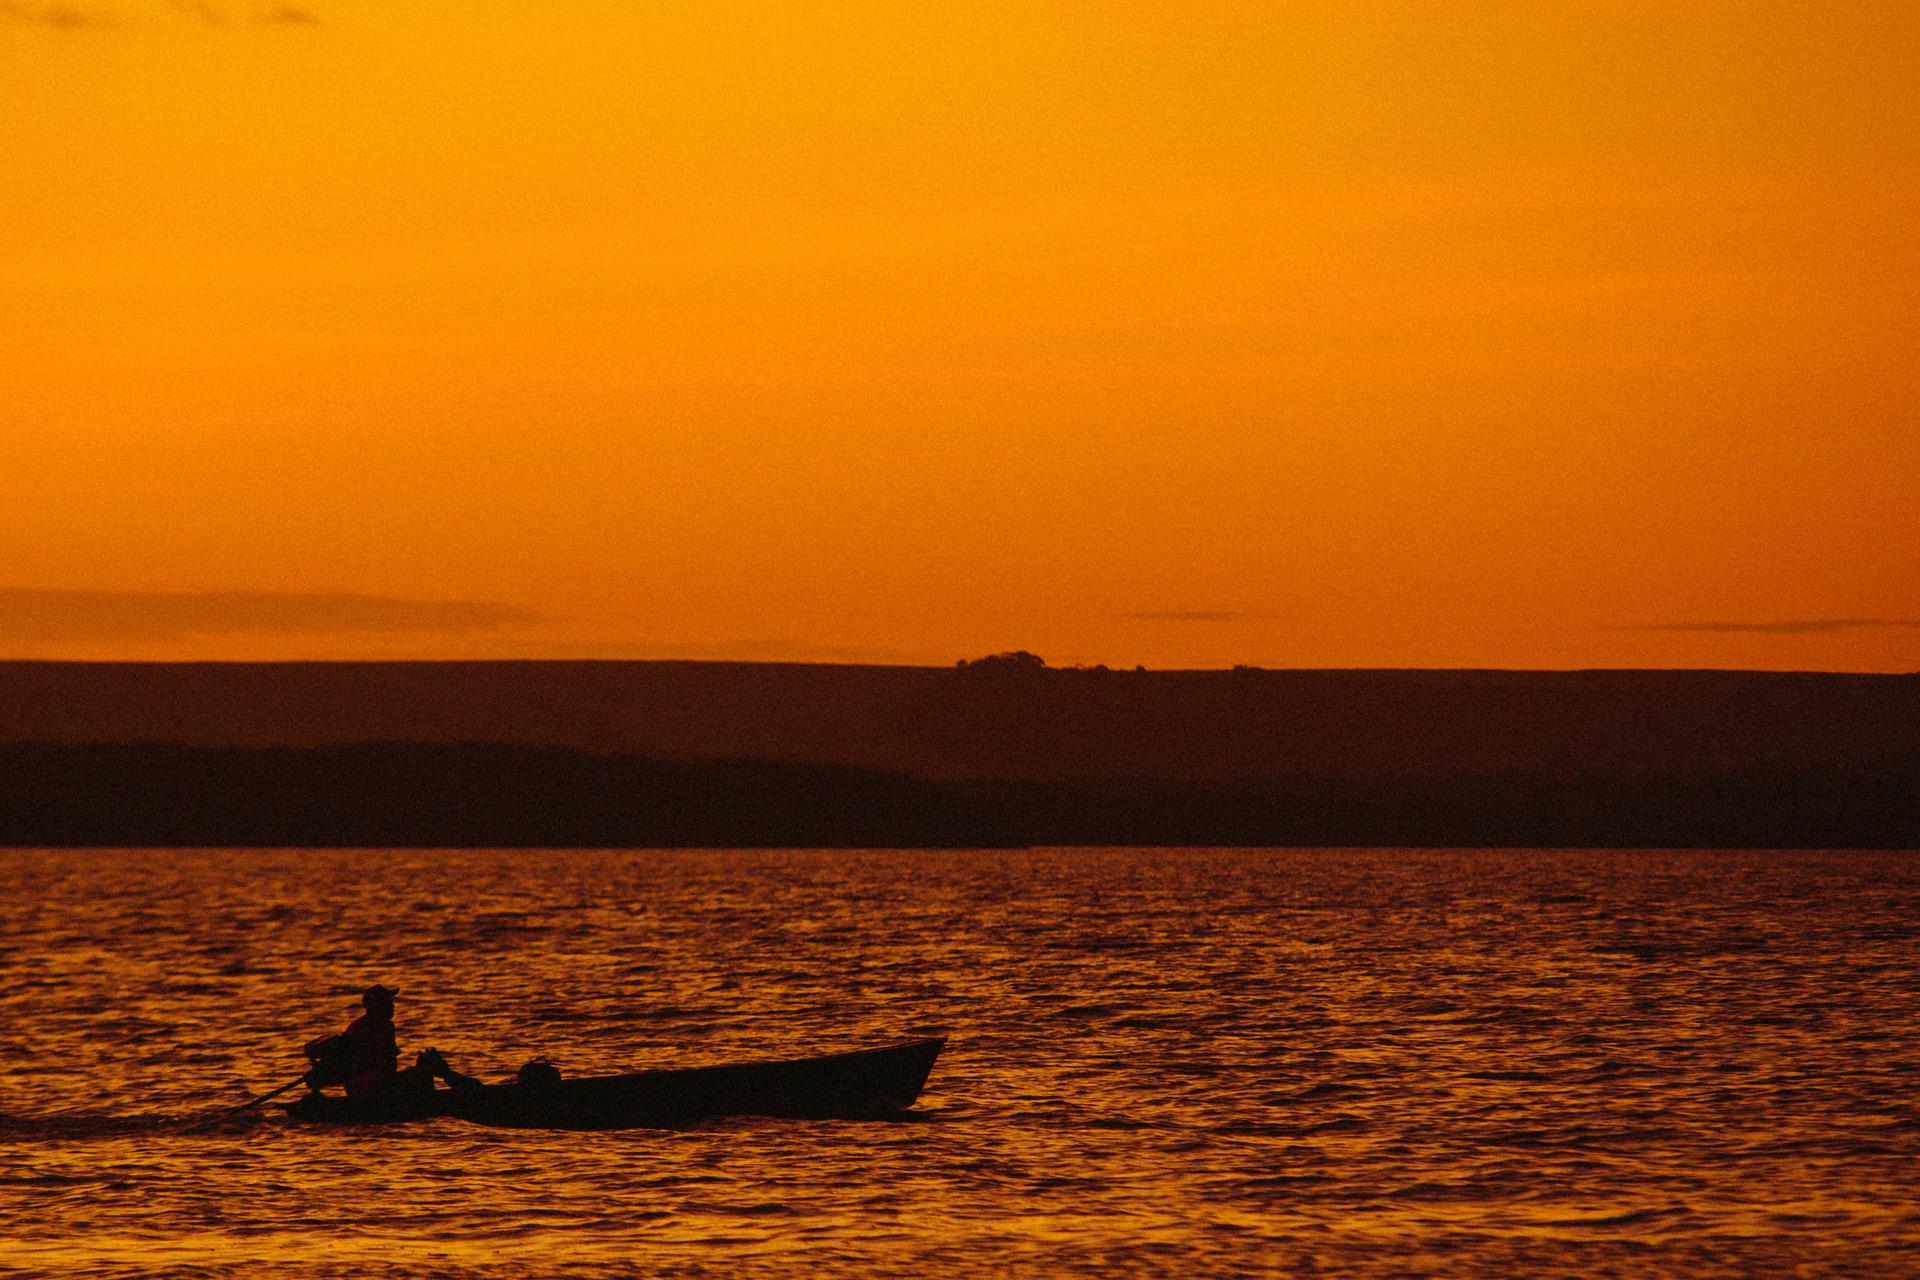 paraiba, joao pessoa, cabedelo, fineart, sunset, por do sol, barco,